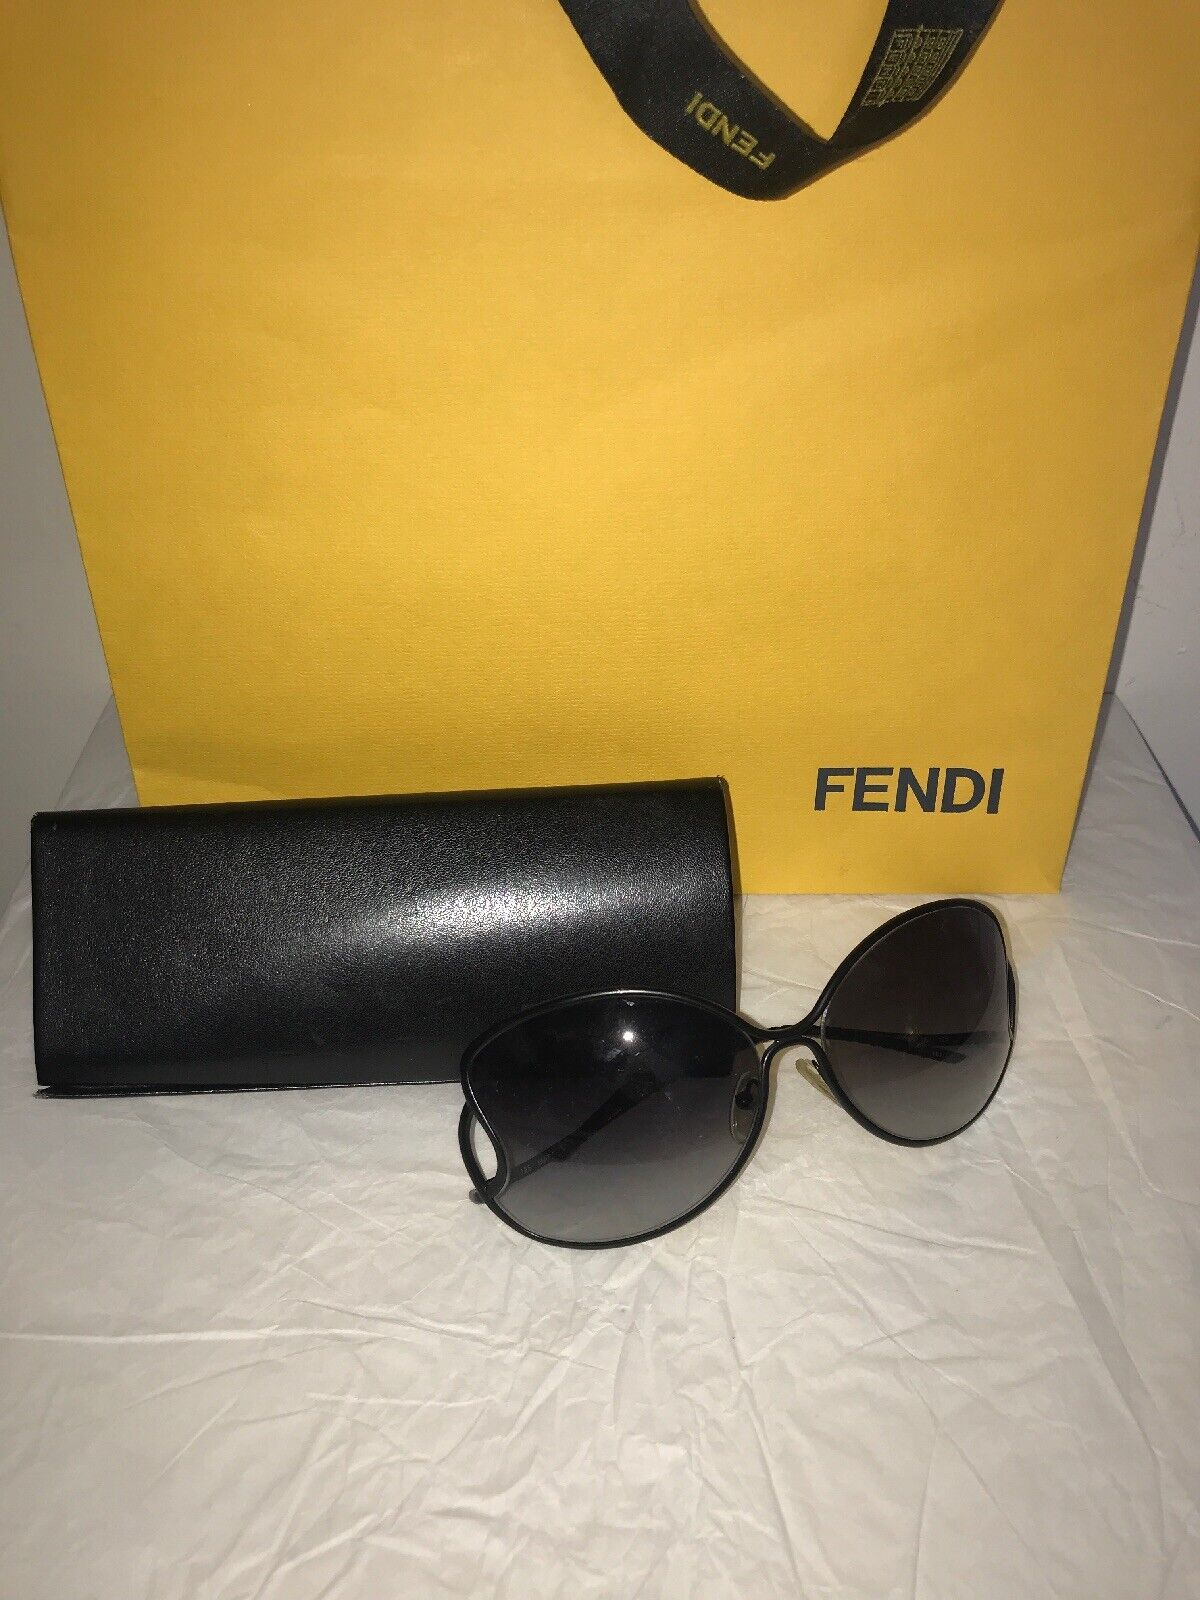 100% Authentic Black Fendi Sunglasses Made In Italy W/case, Dust Cloth